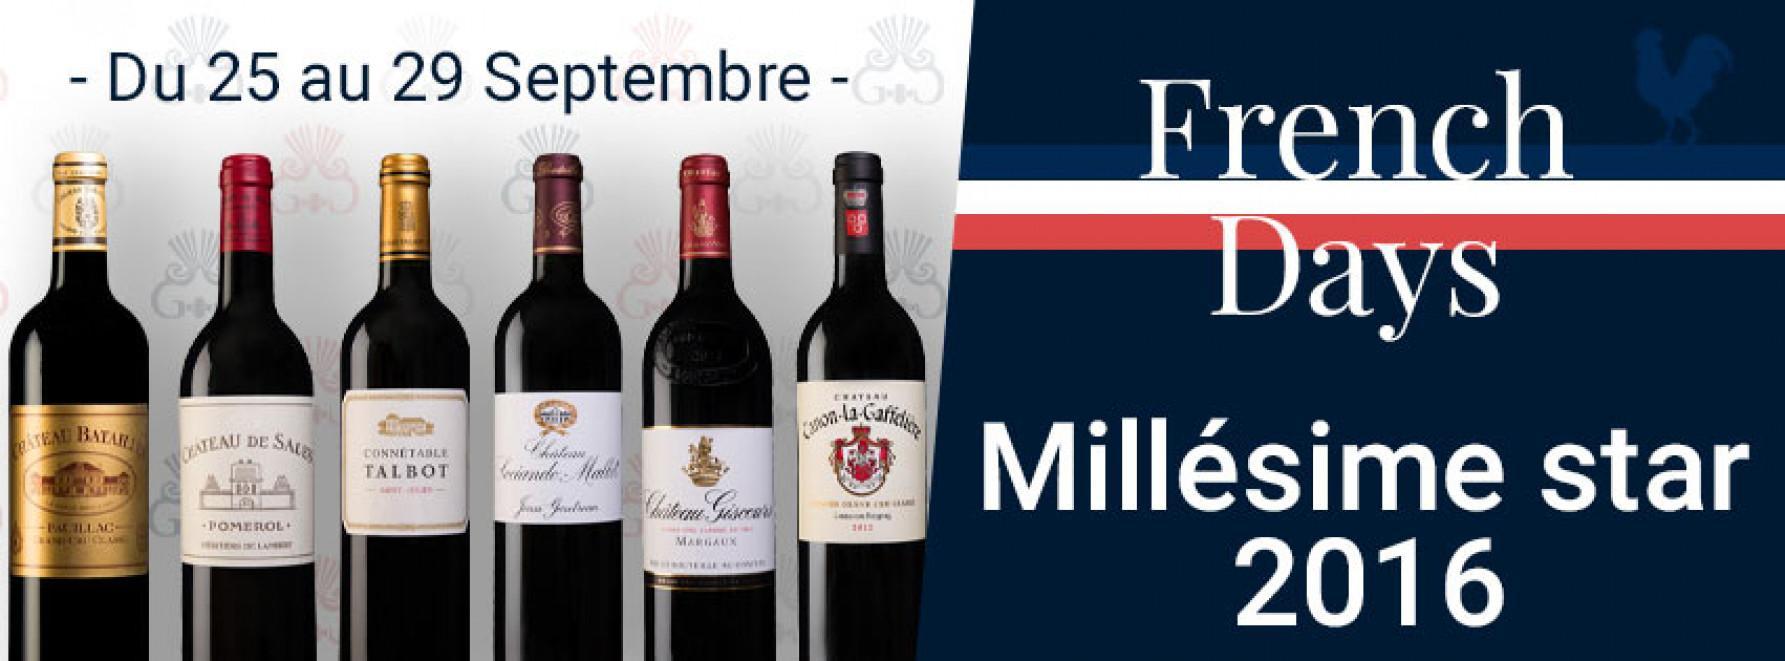 French Days | Millésime star 2016